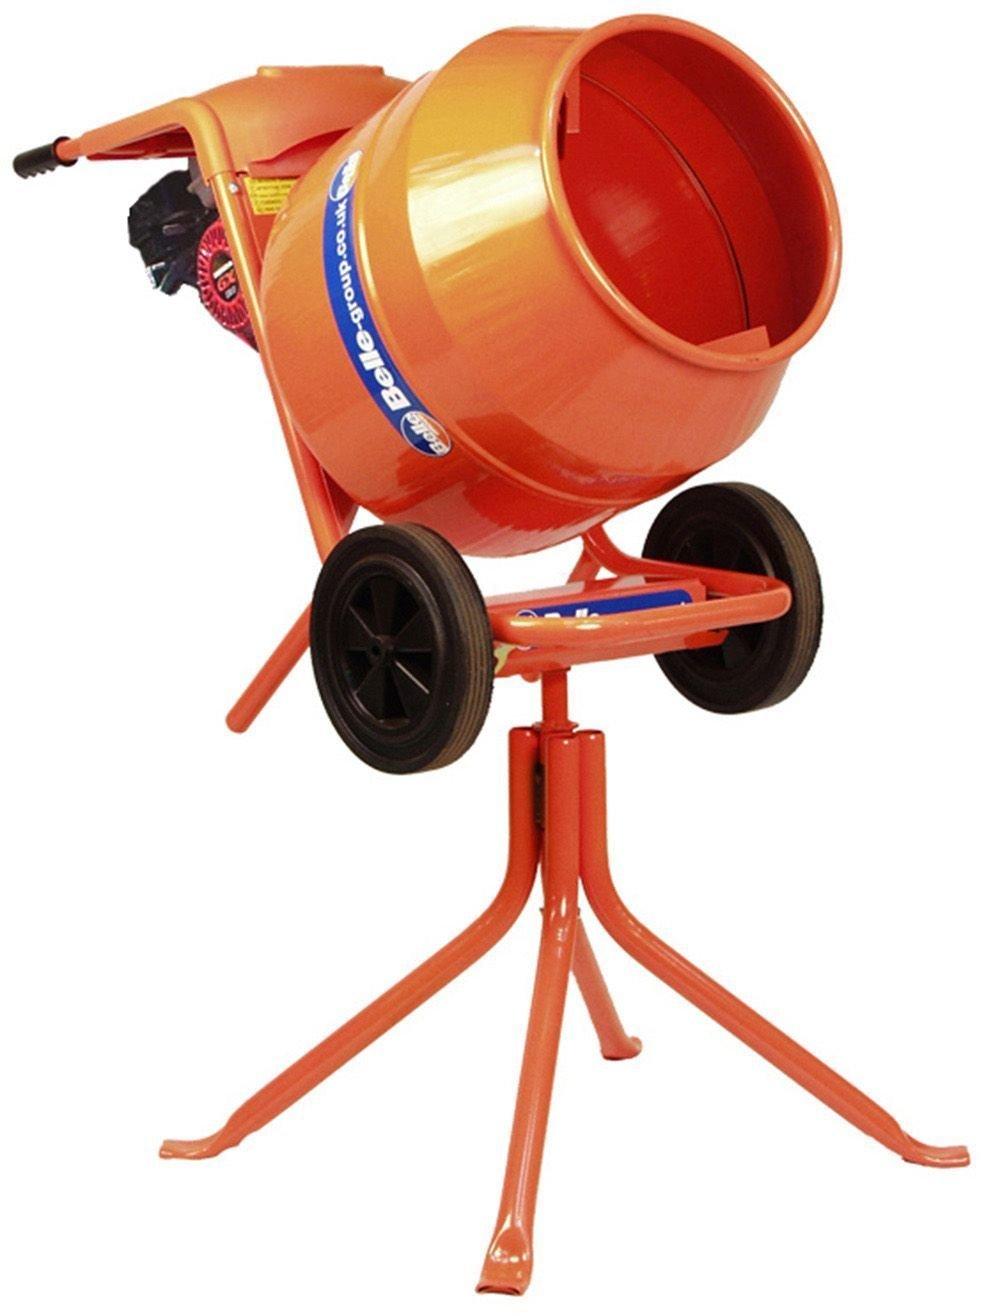 Belle M54B Belle Minimix 150 Petrol Cement Mixer